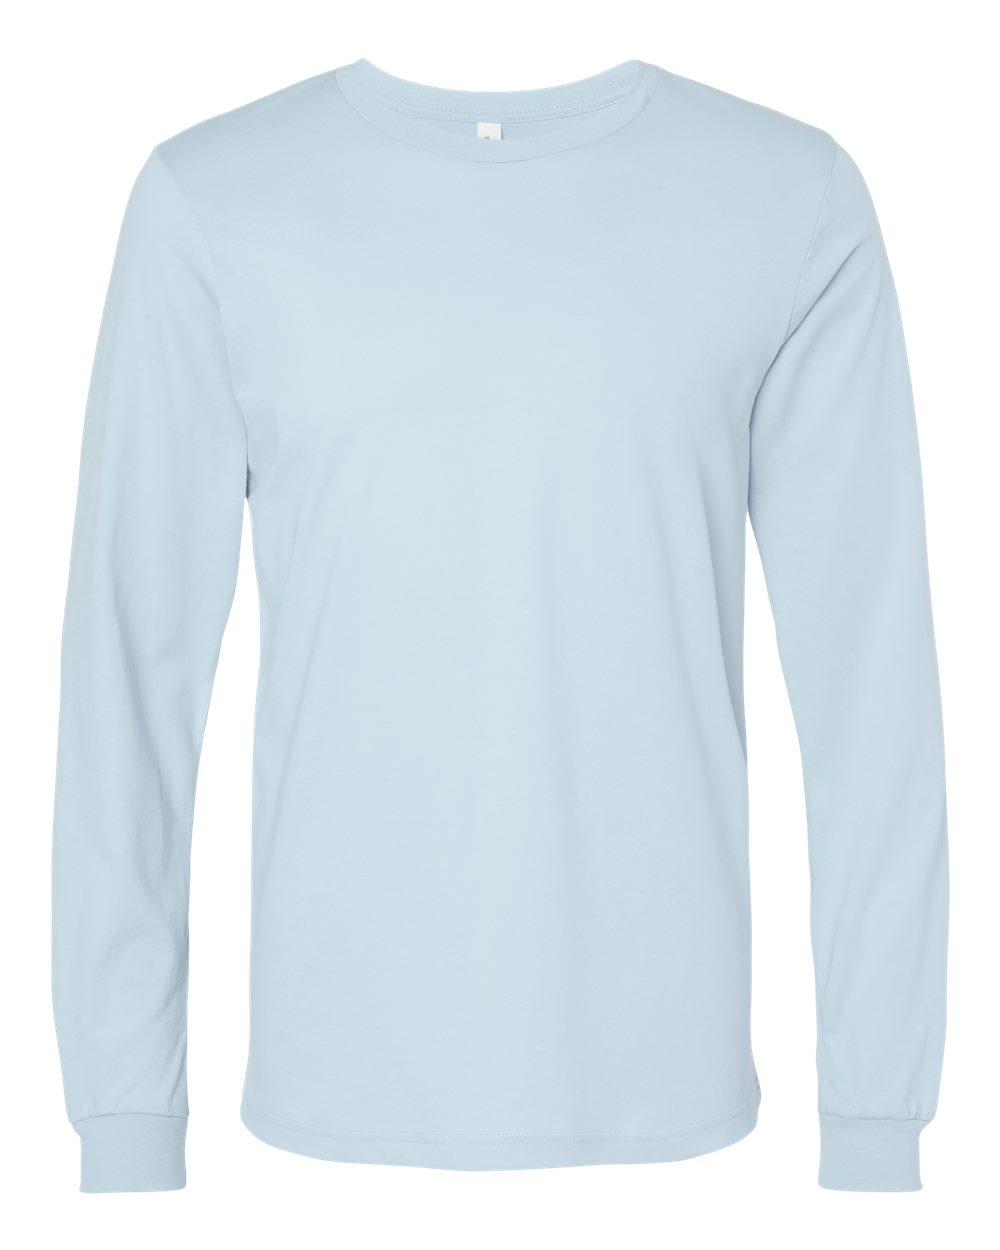 Bella-Canvas-Mens-Blank-Top-Long-Sleeve-Jersey-Tee-T-Shirt-3501-up-to-3XL thumbnail 15